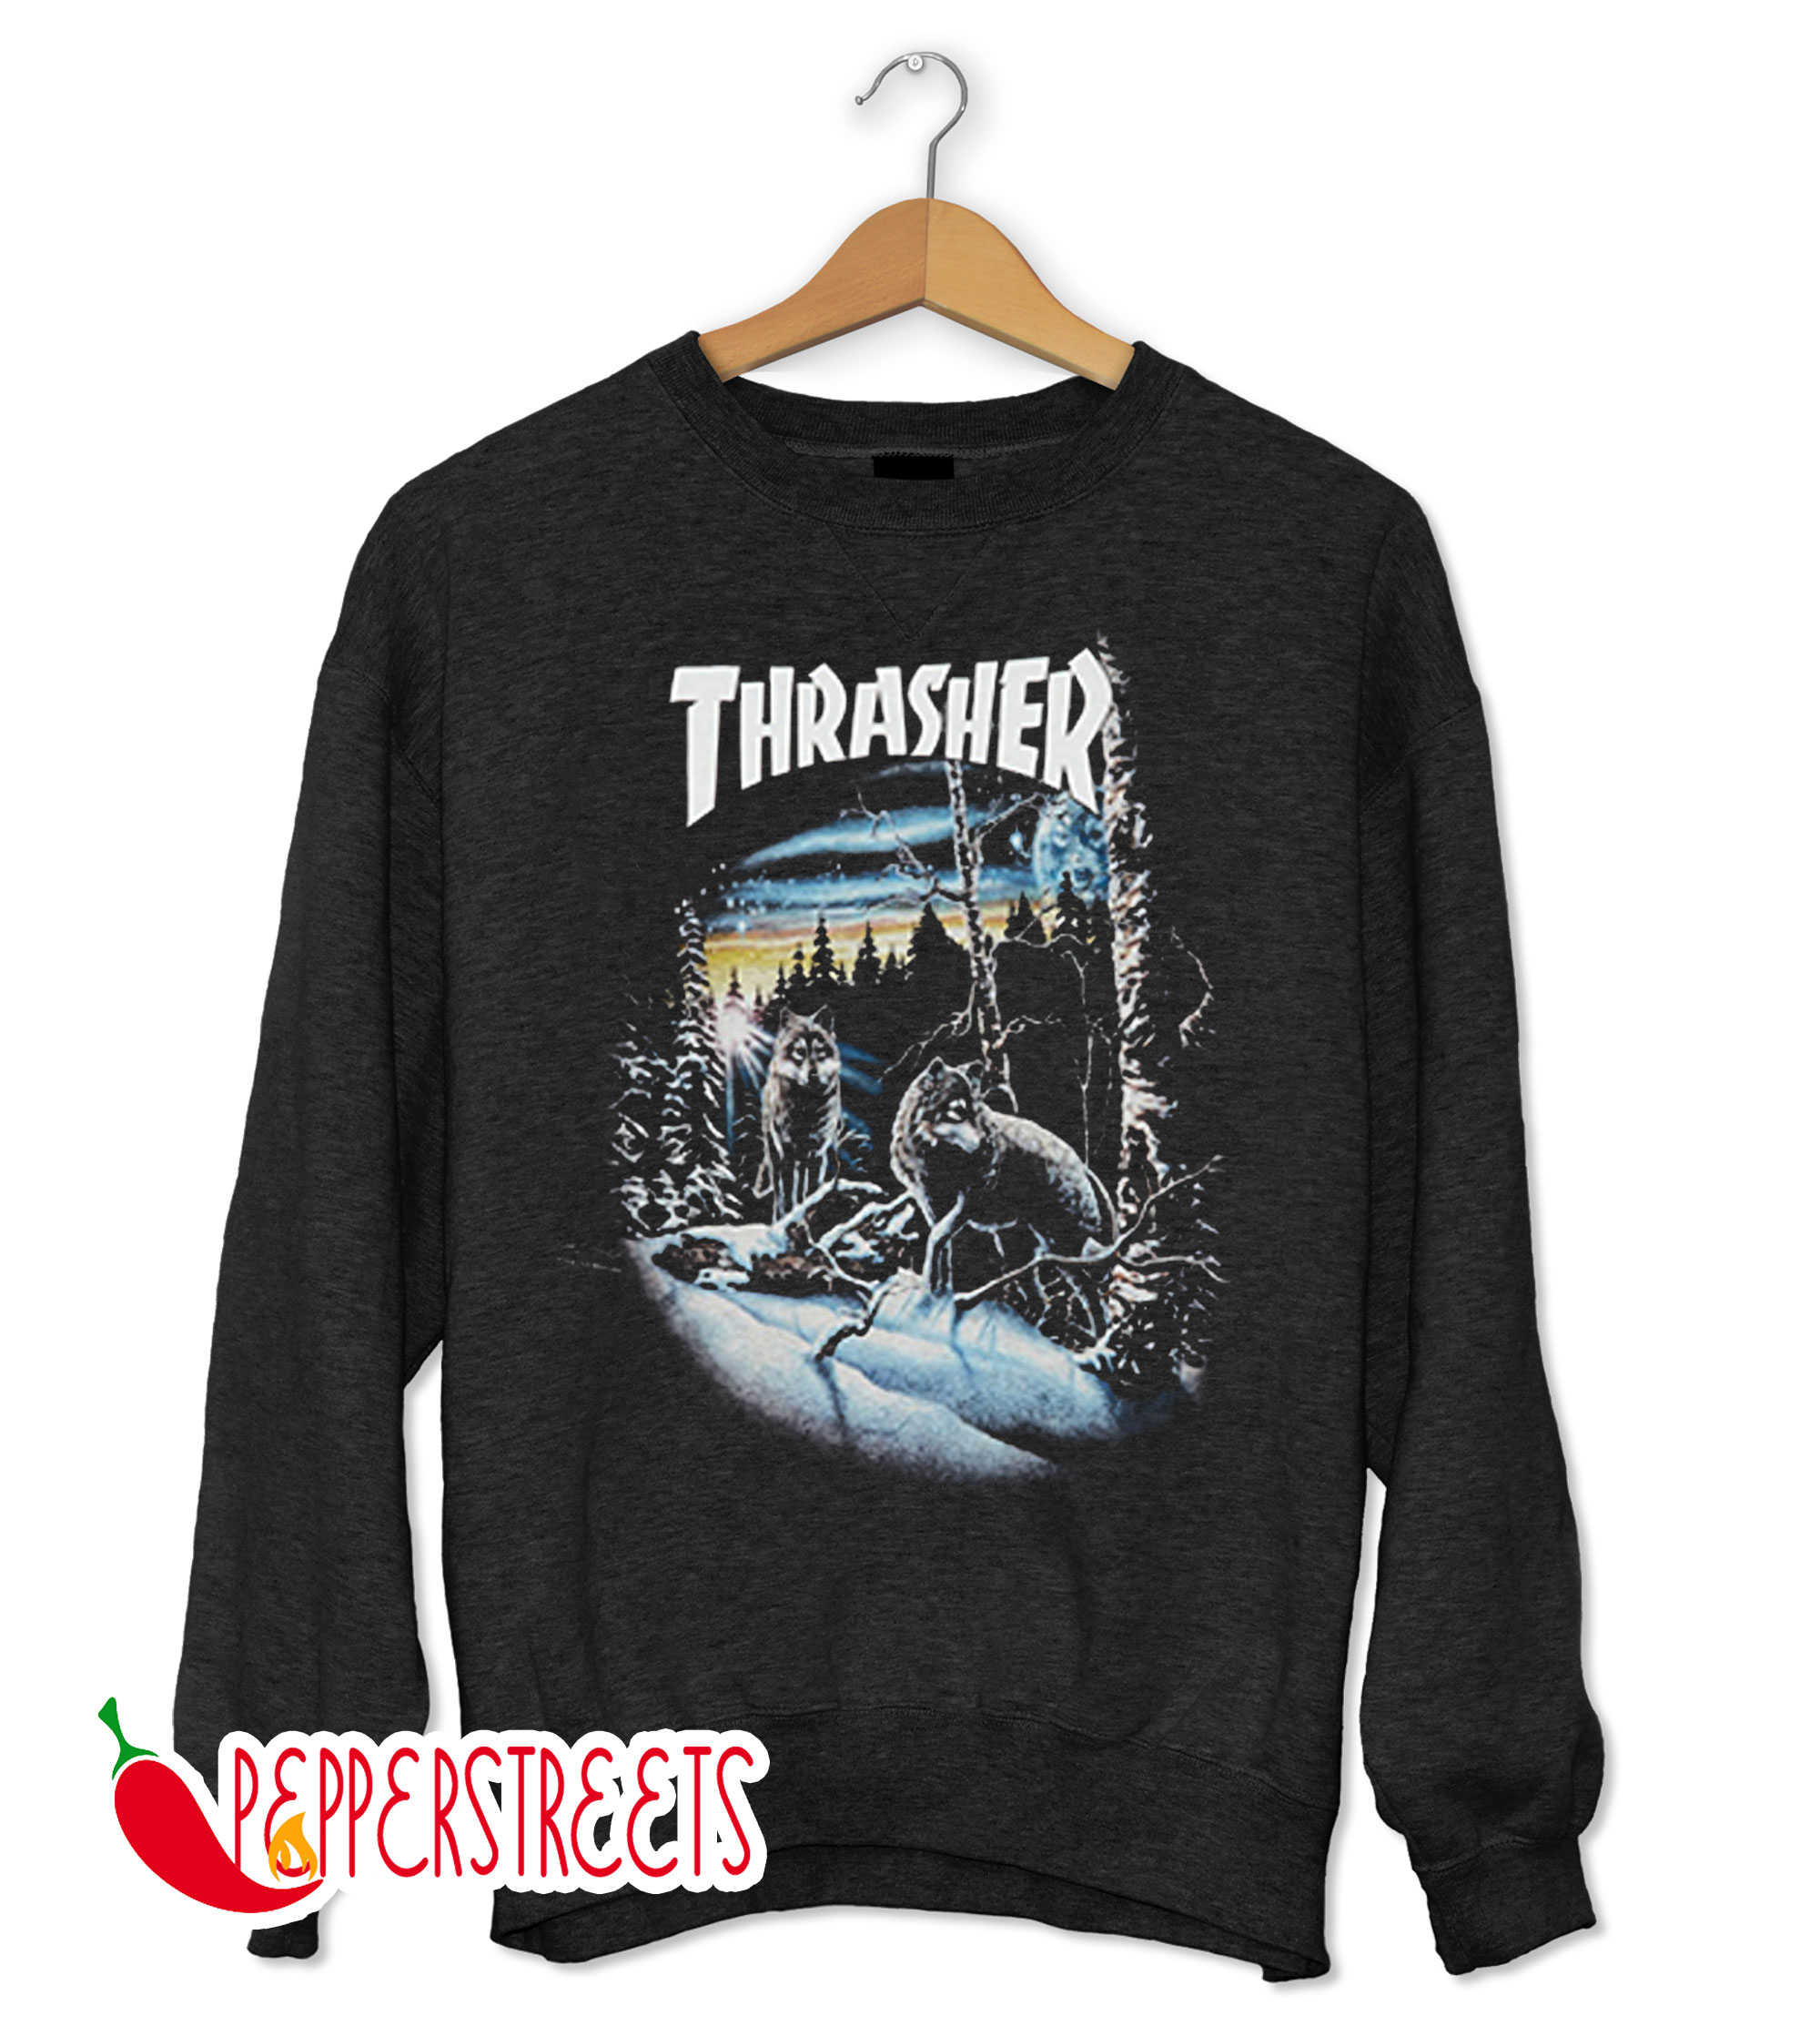 THRASHER 13 WOLVES SWEATSHIRT